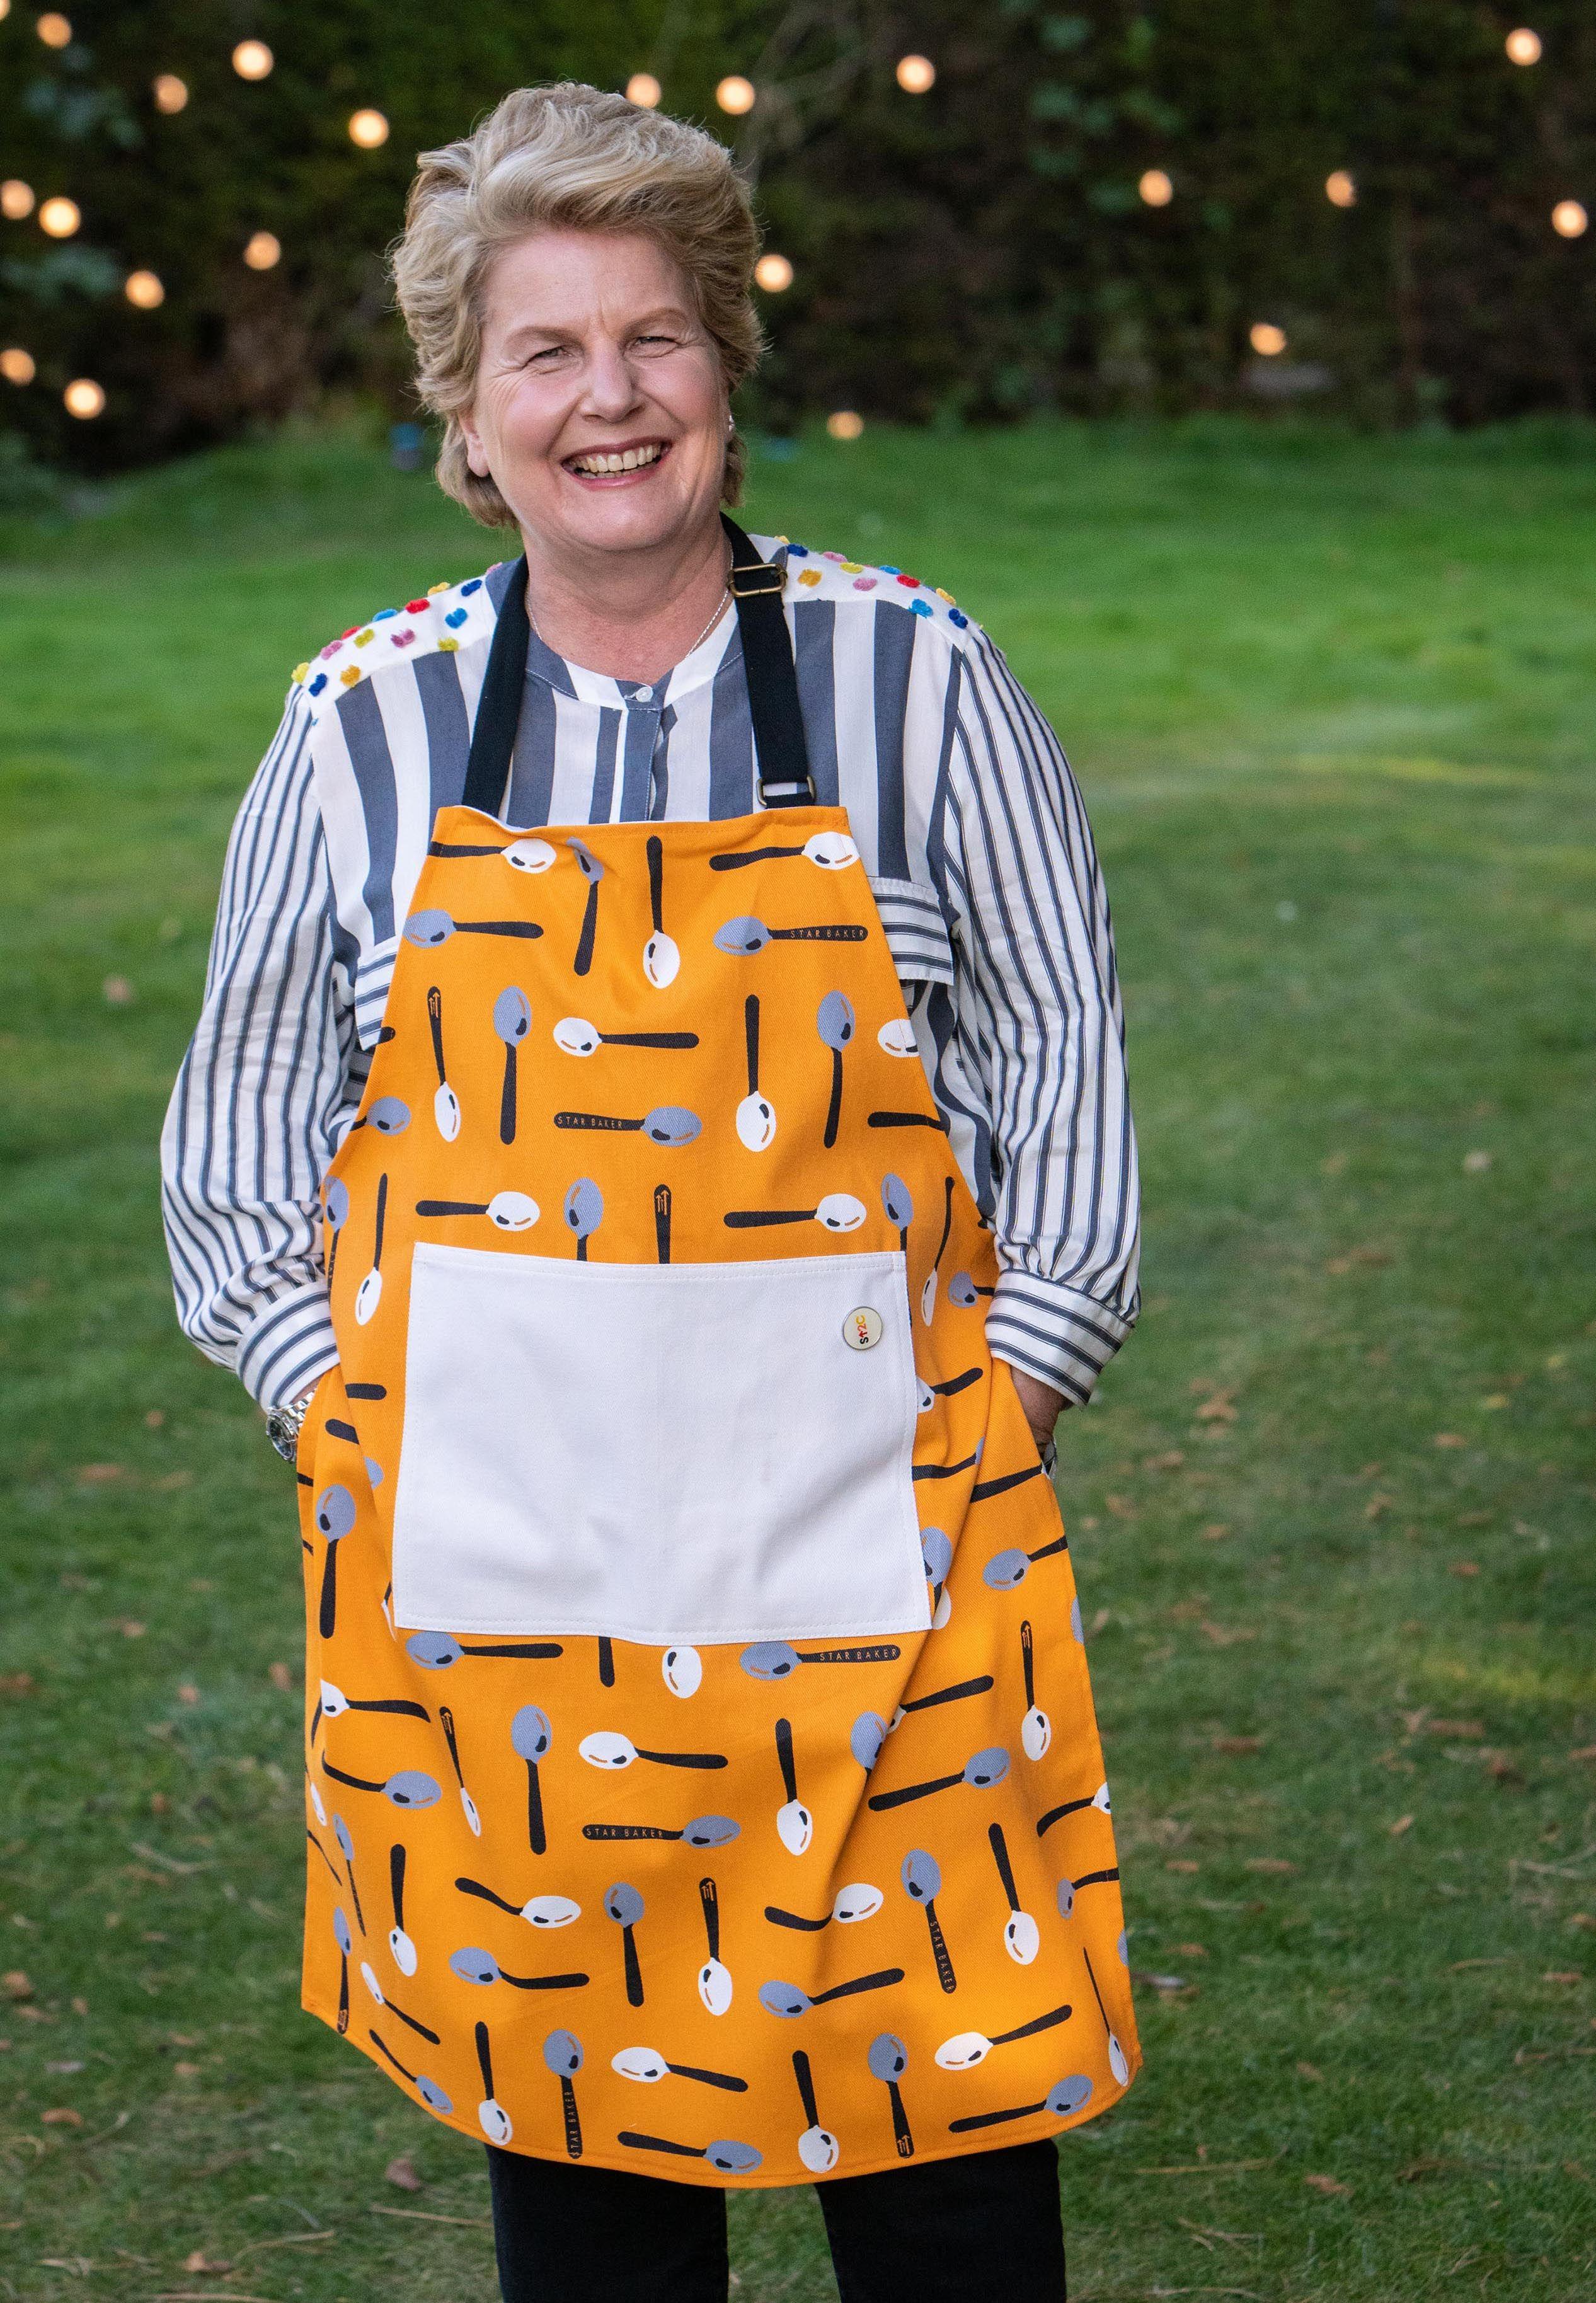 Sandi Toksvig announces she is leaving The Great British Bake Off